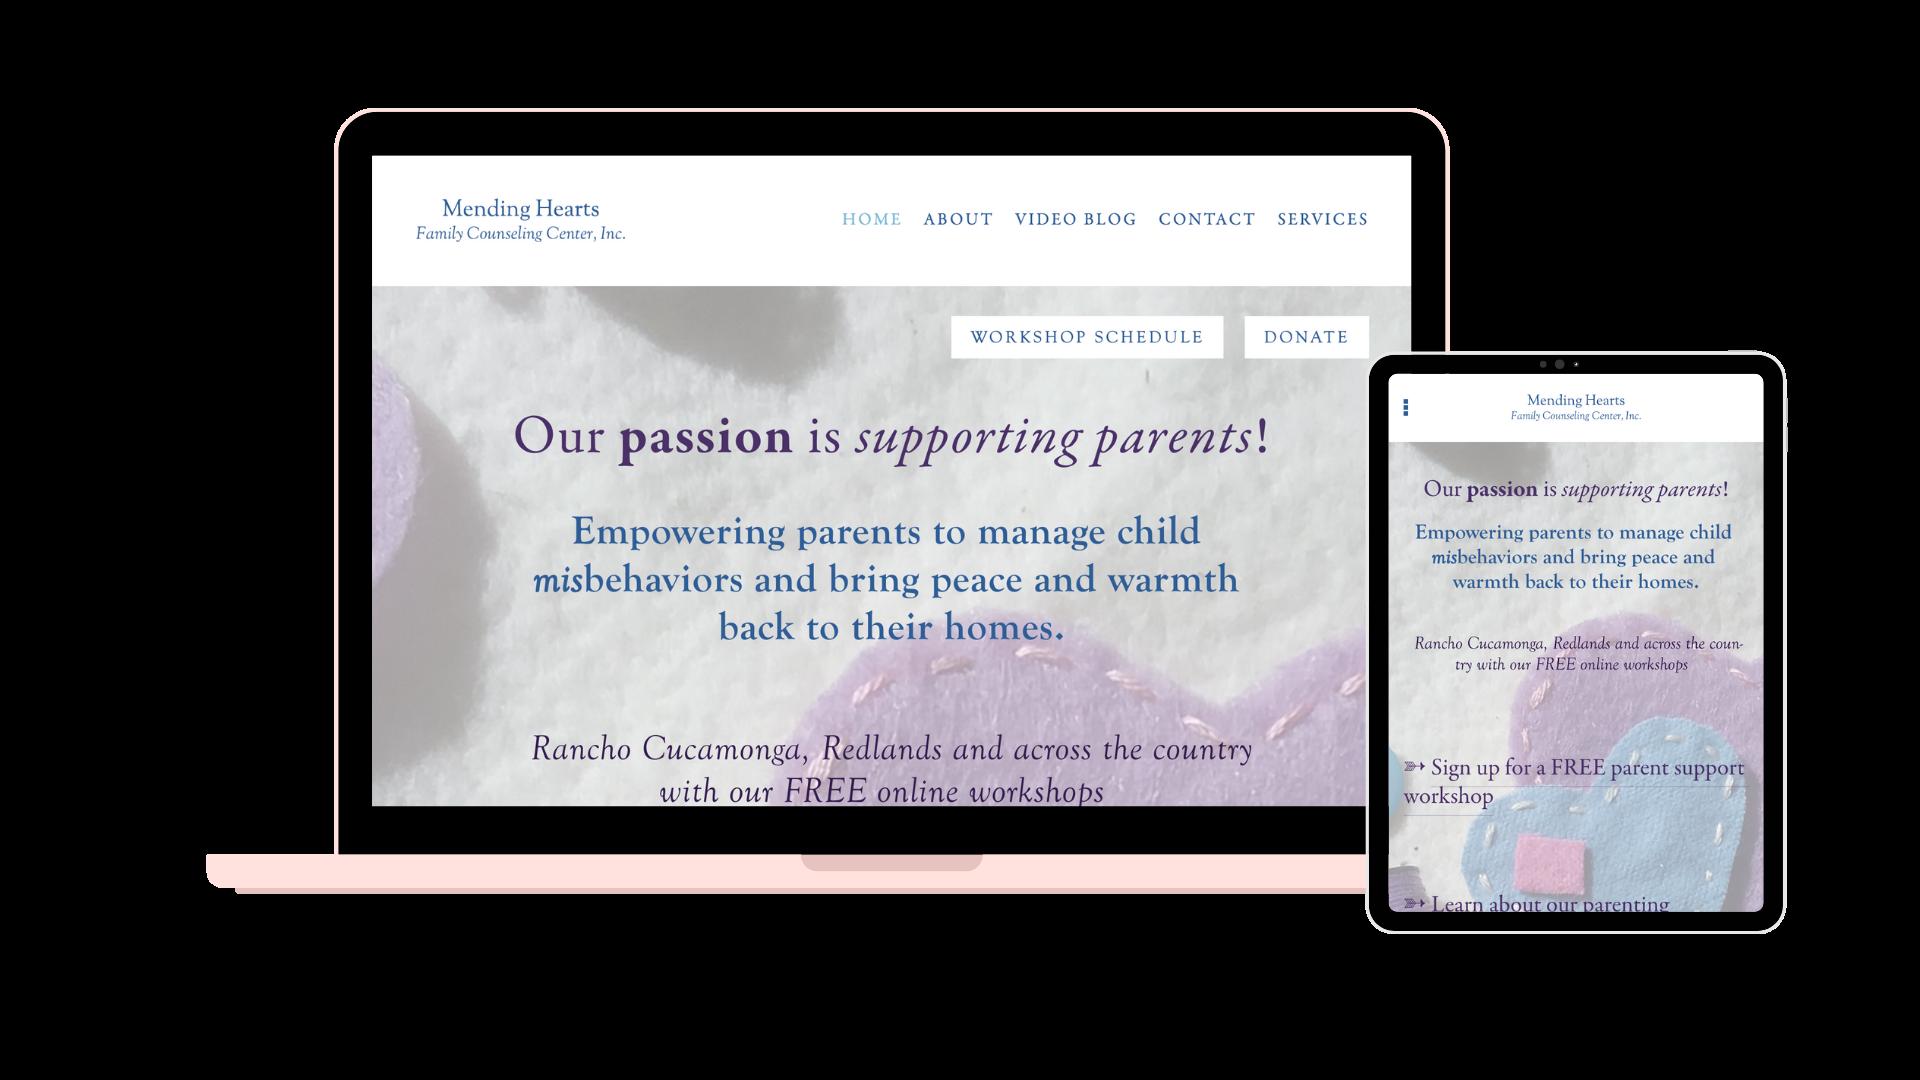 Mending Hearts Family Counseling Center, Inc. - Website, Branding, Copywriting